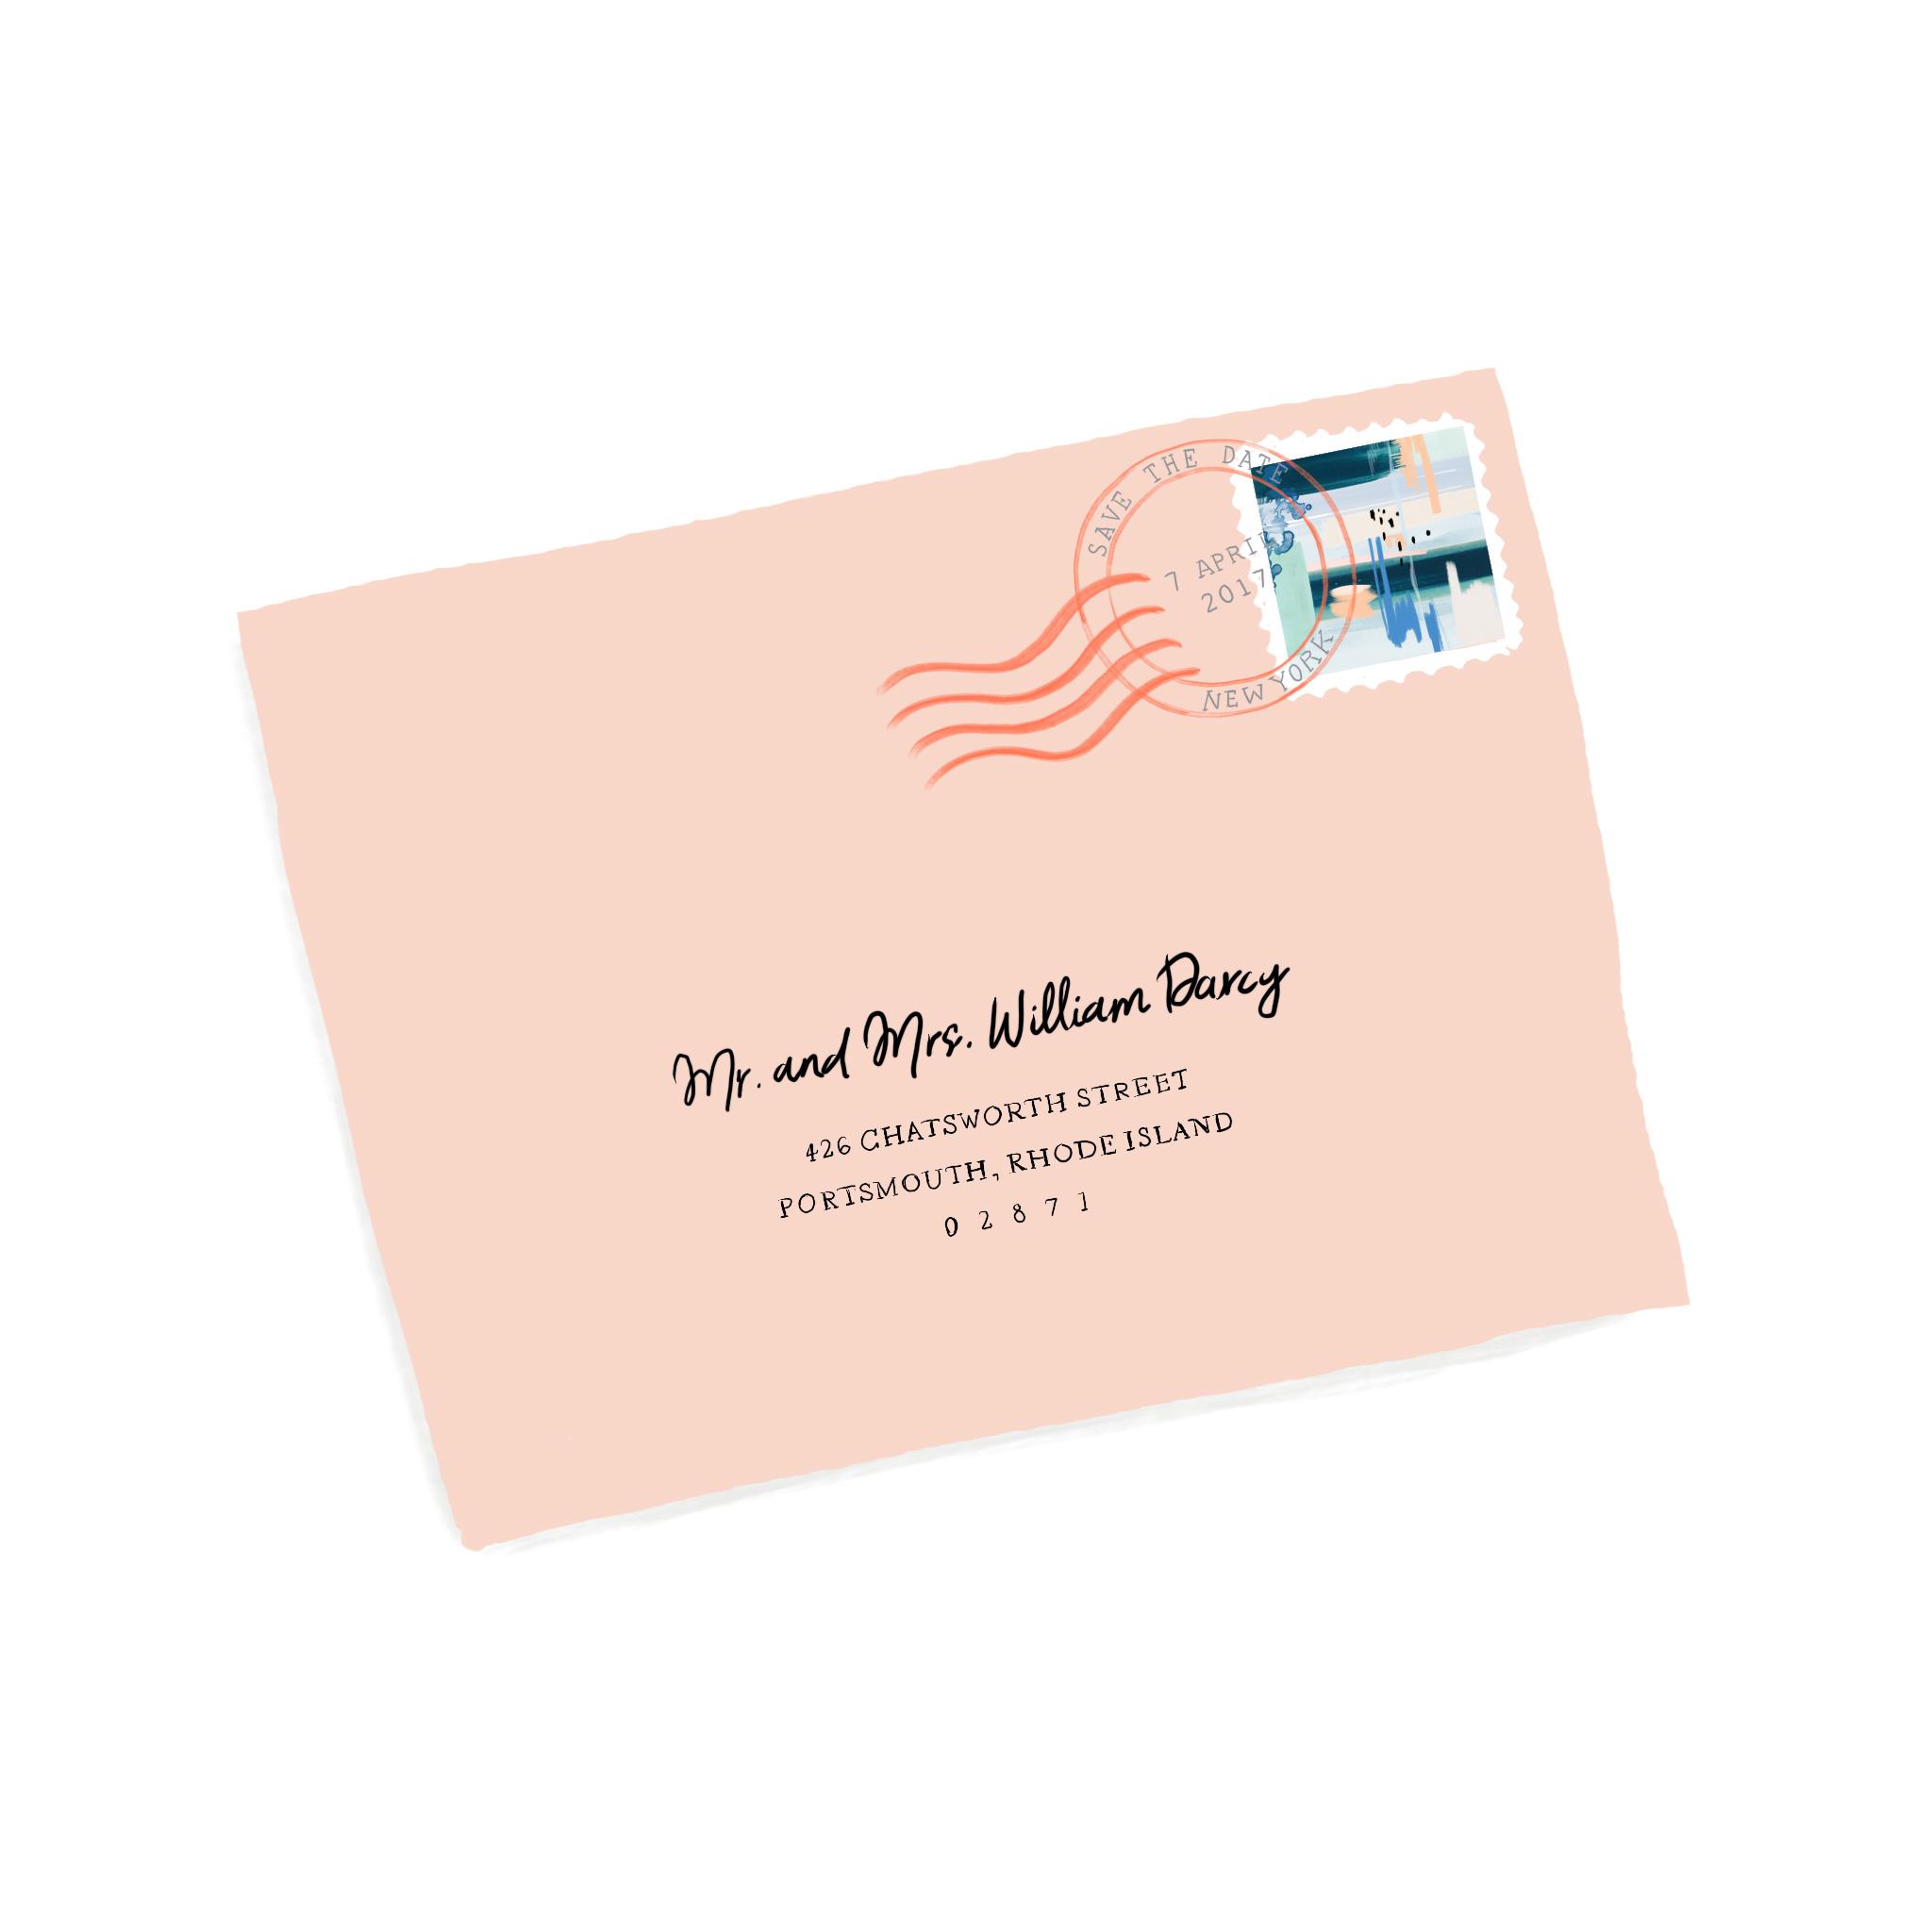 EtiquetteGuide_Envelopes_WhentoSend.jpg